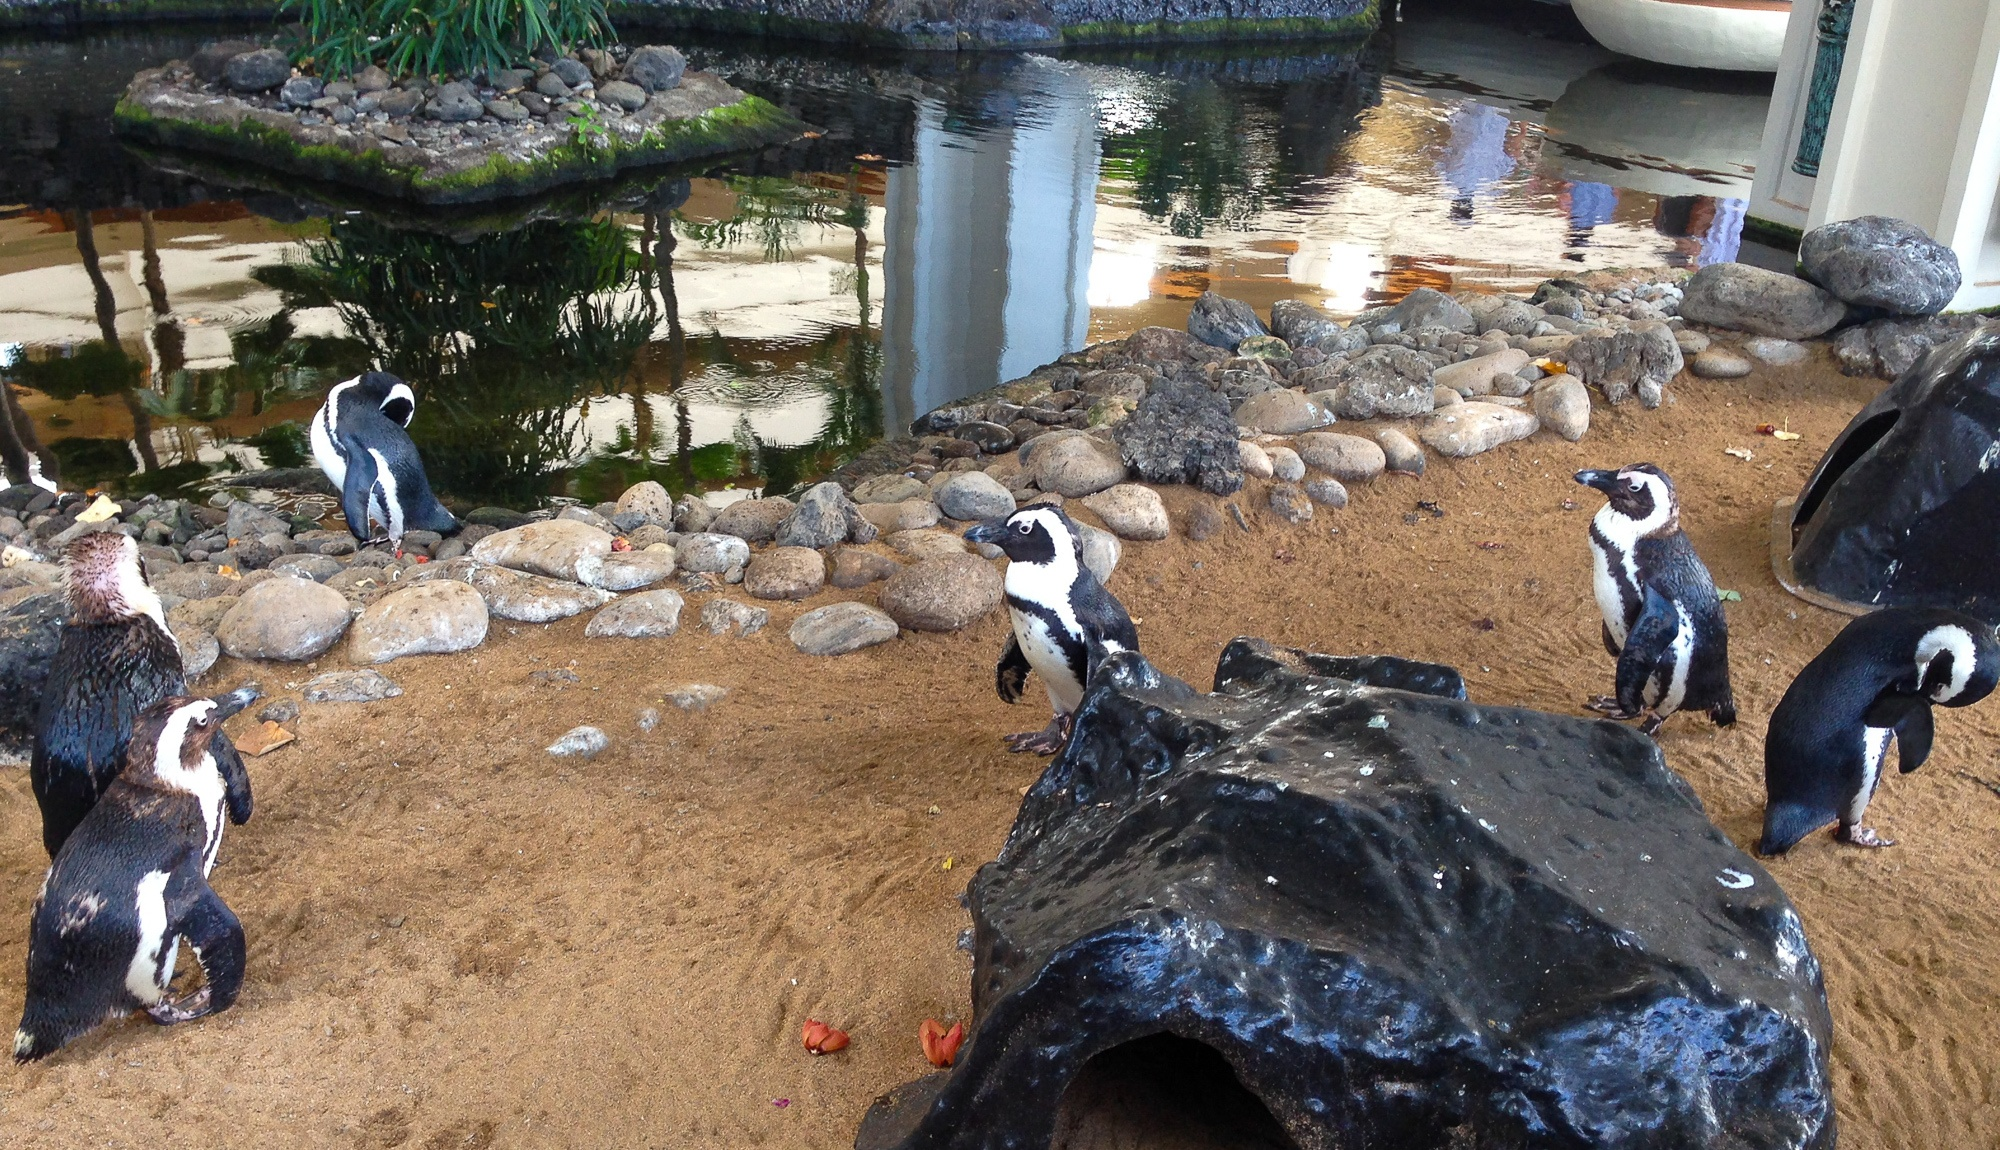 Warm weather penguins at Hyatt Regency Maui